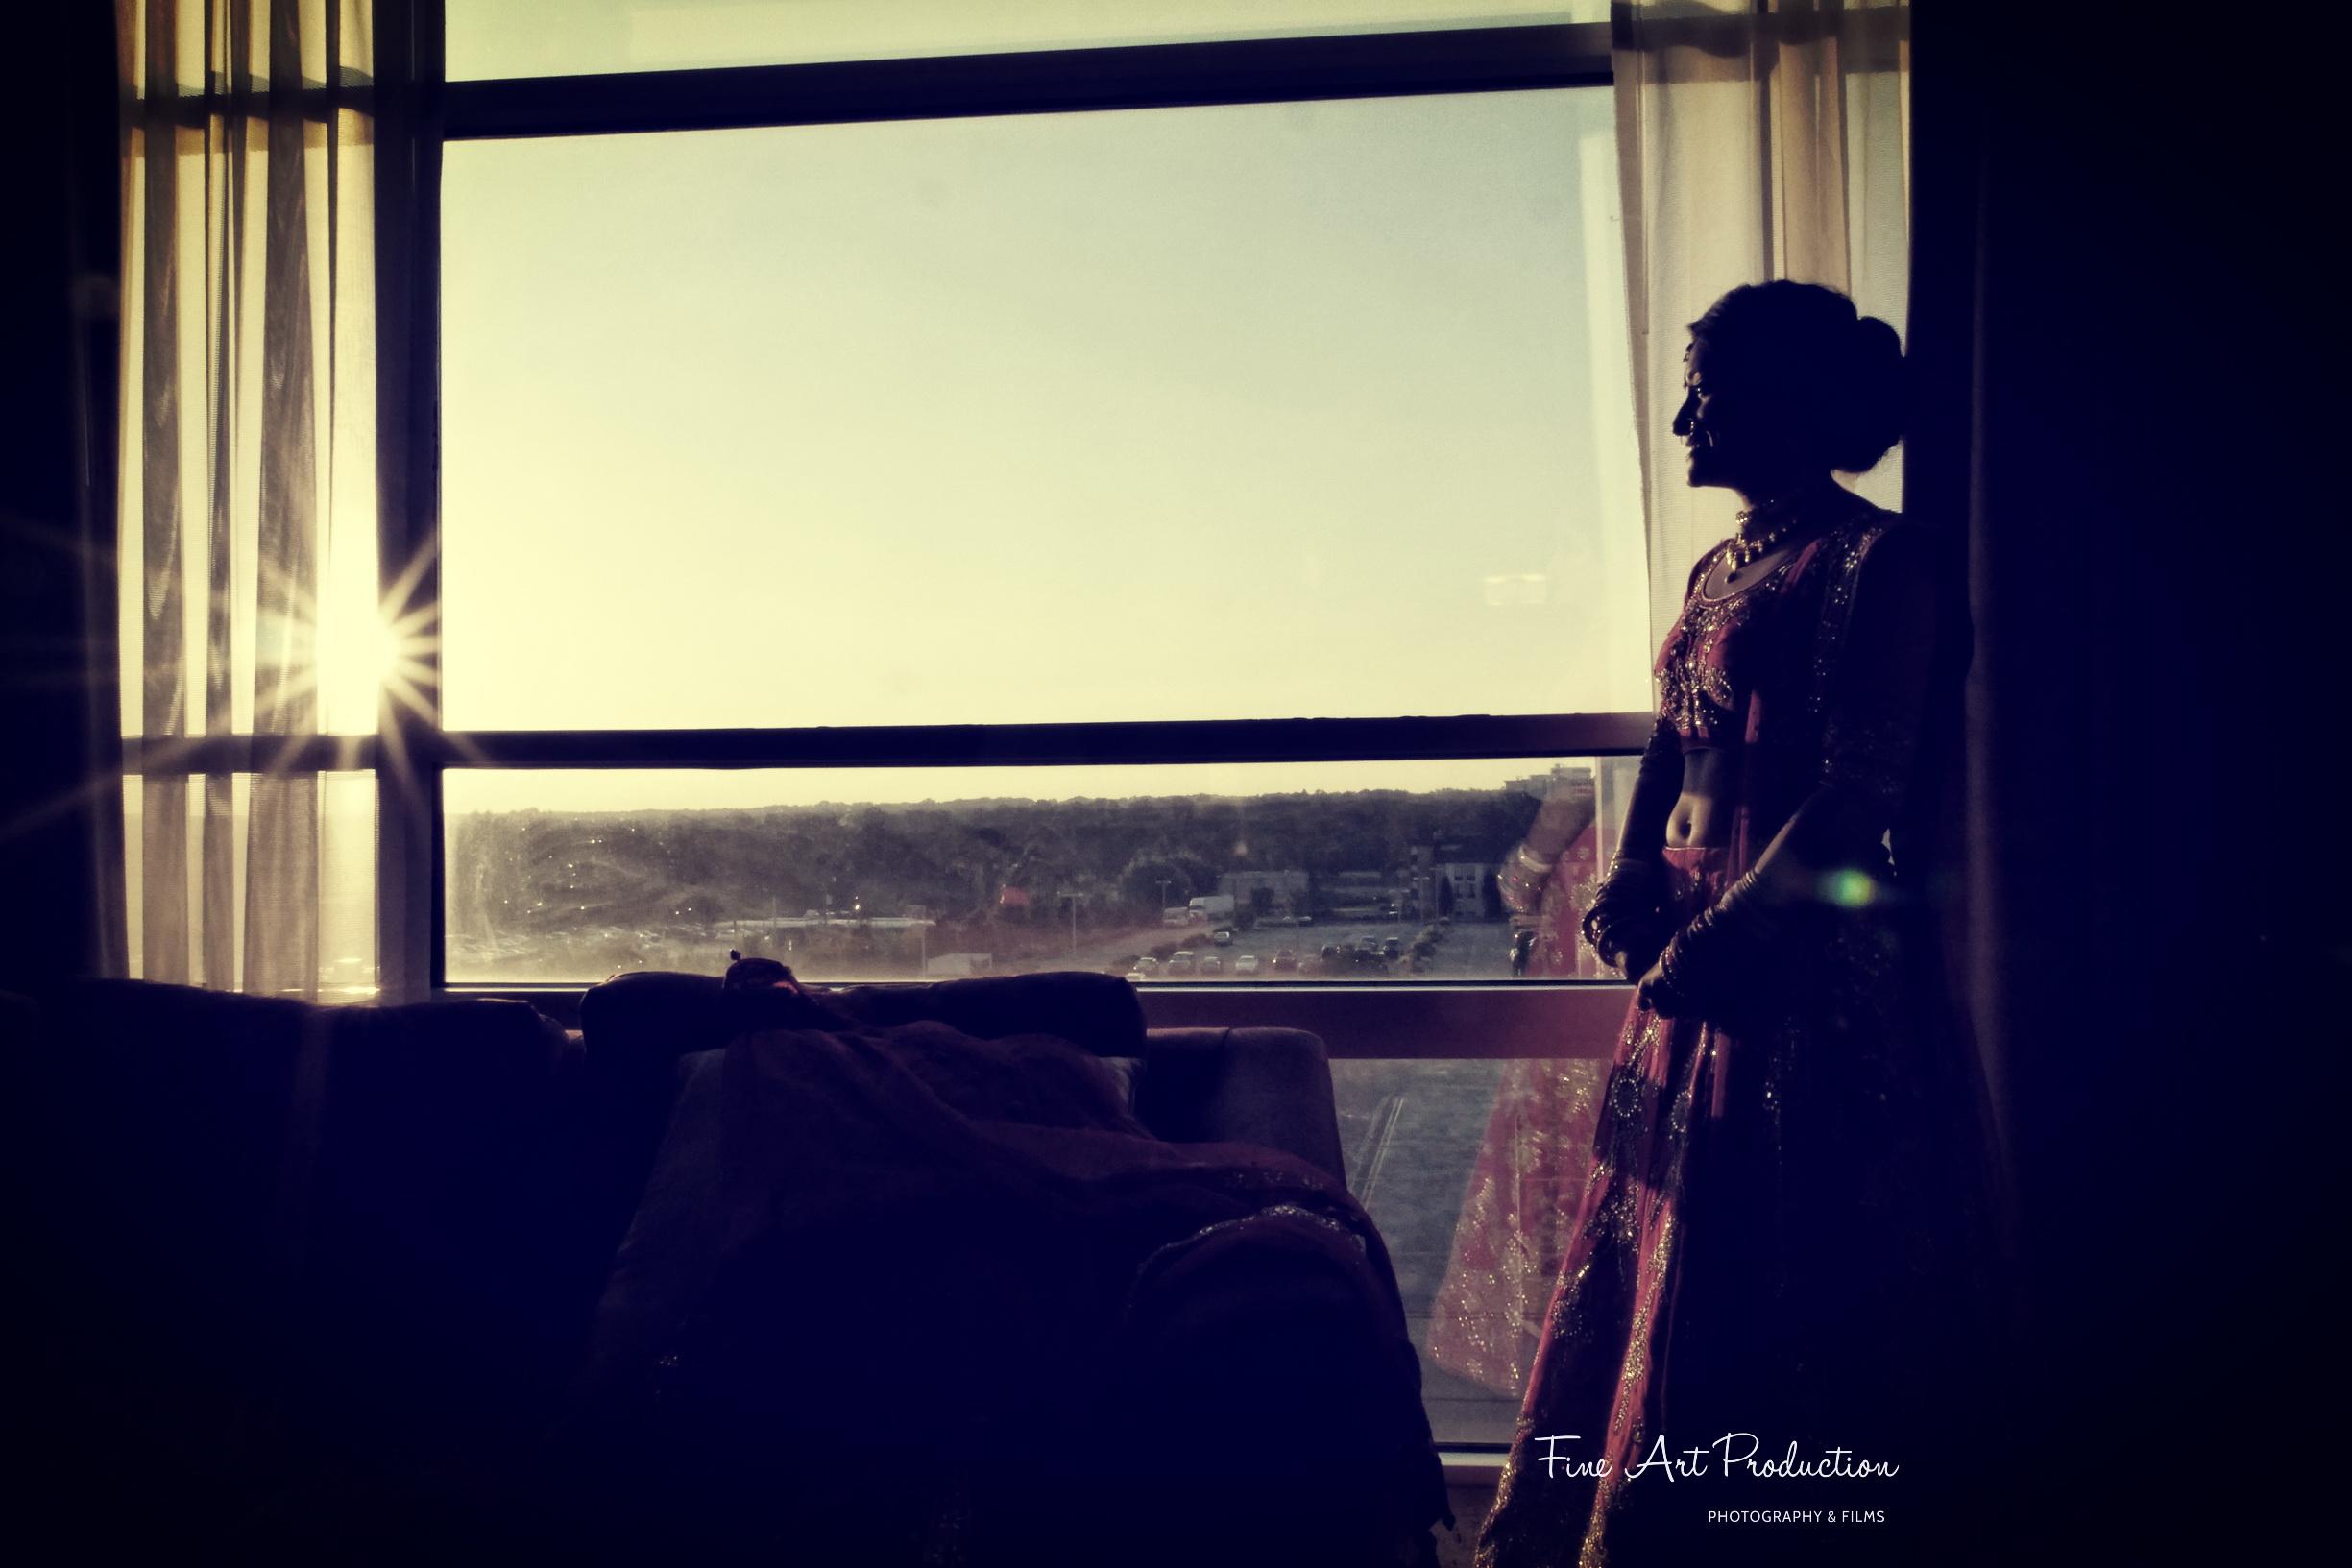 india-wedding-photographer-fine-art-production-chirali-amish-thakkar_0039